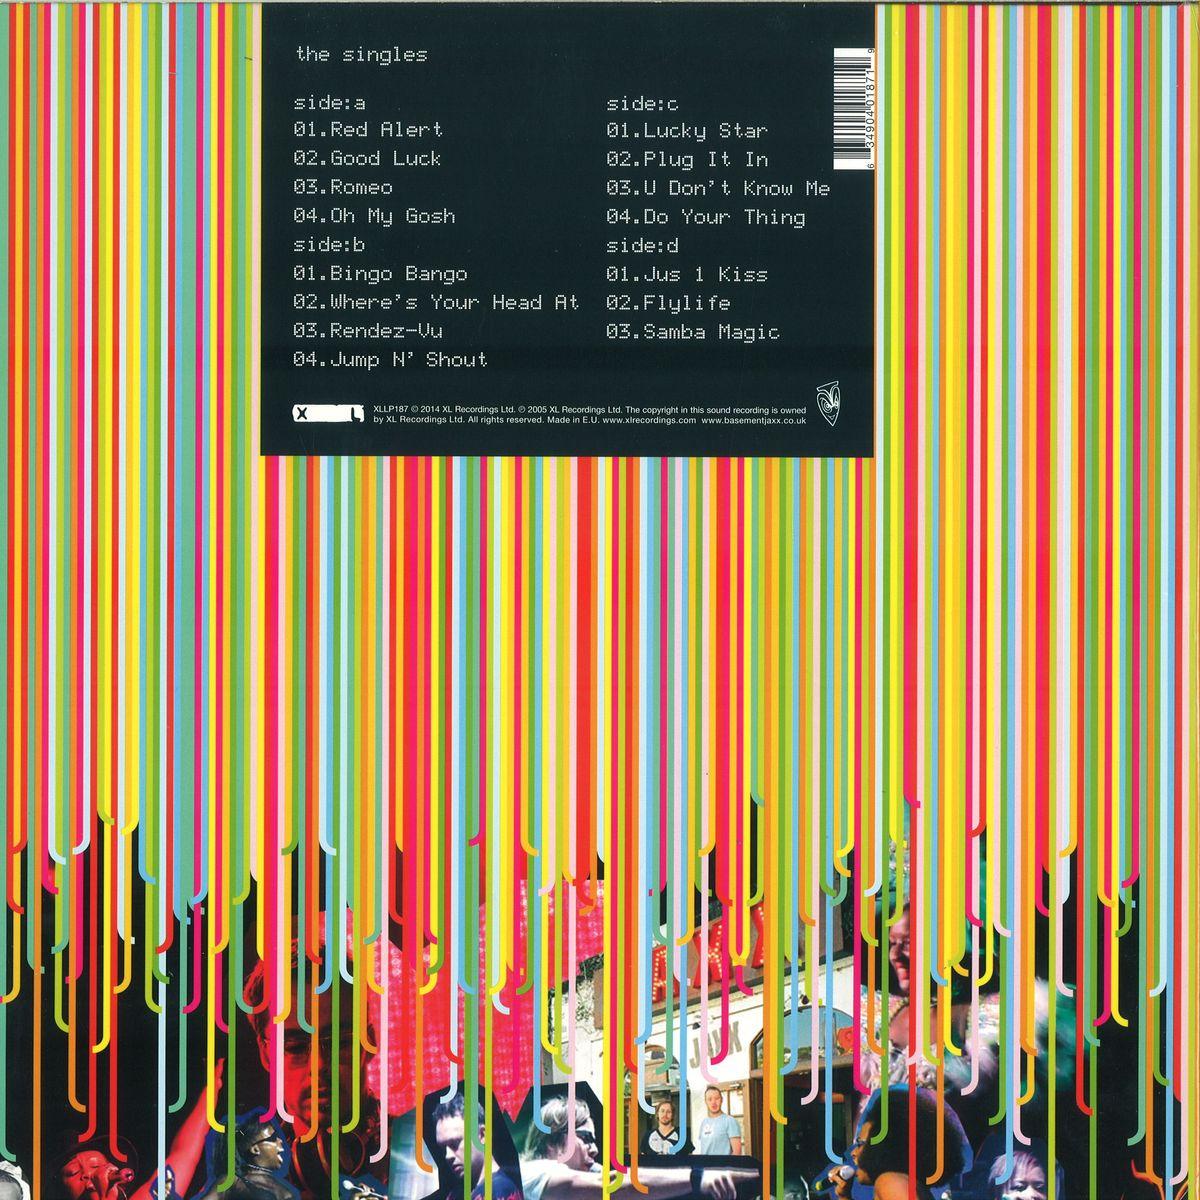 Basement Jaxx The Singles Coloured Vinyl Edition  XL Records - Basement jaxx good luck